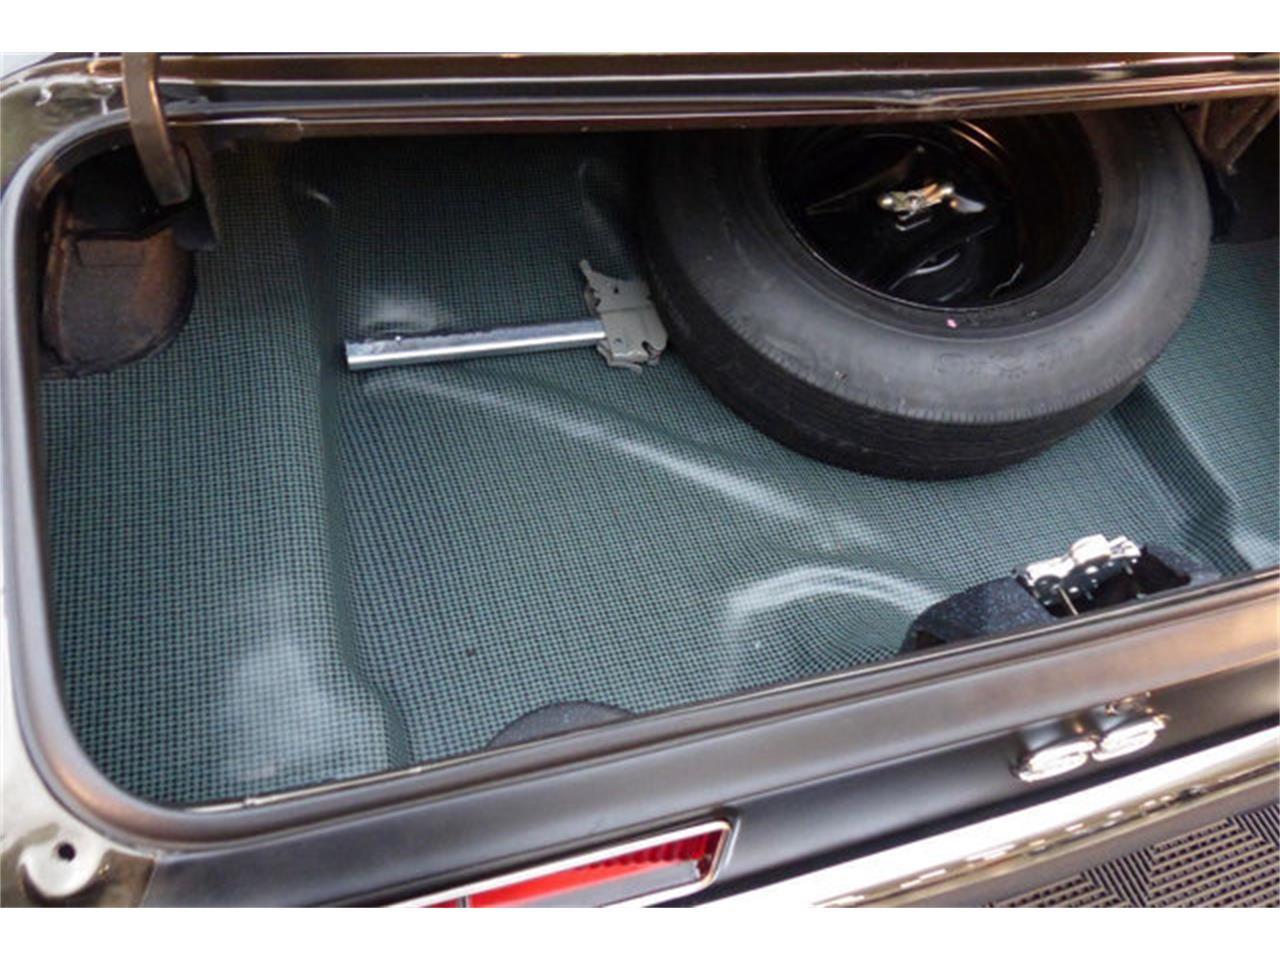 Large Picture of Classic 1969 Chevrolet Camaro located in North Carolina - $79,990.00 - FYZ7